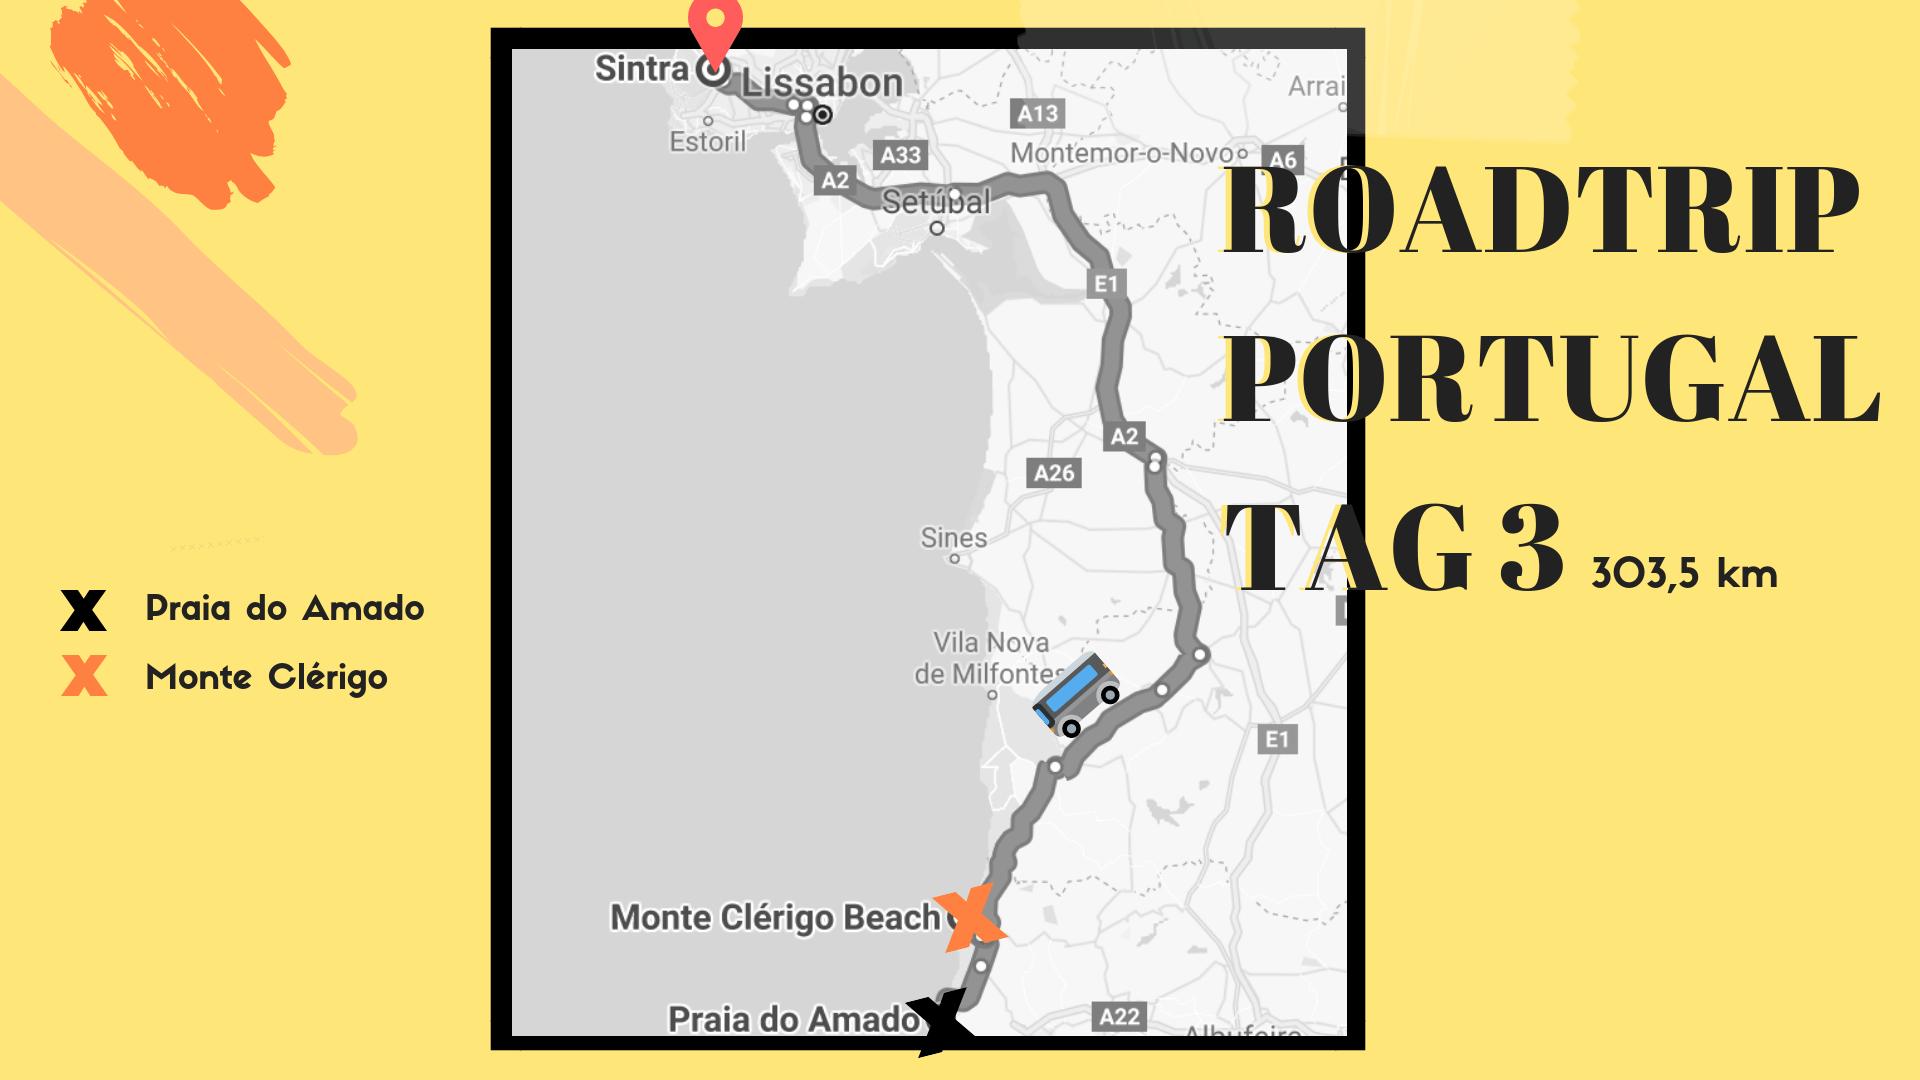 Roadtrip Portugal, Route Tag 3, 21